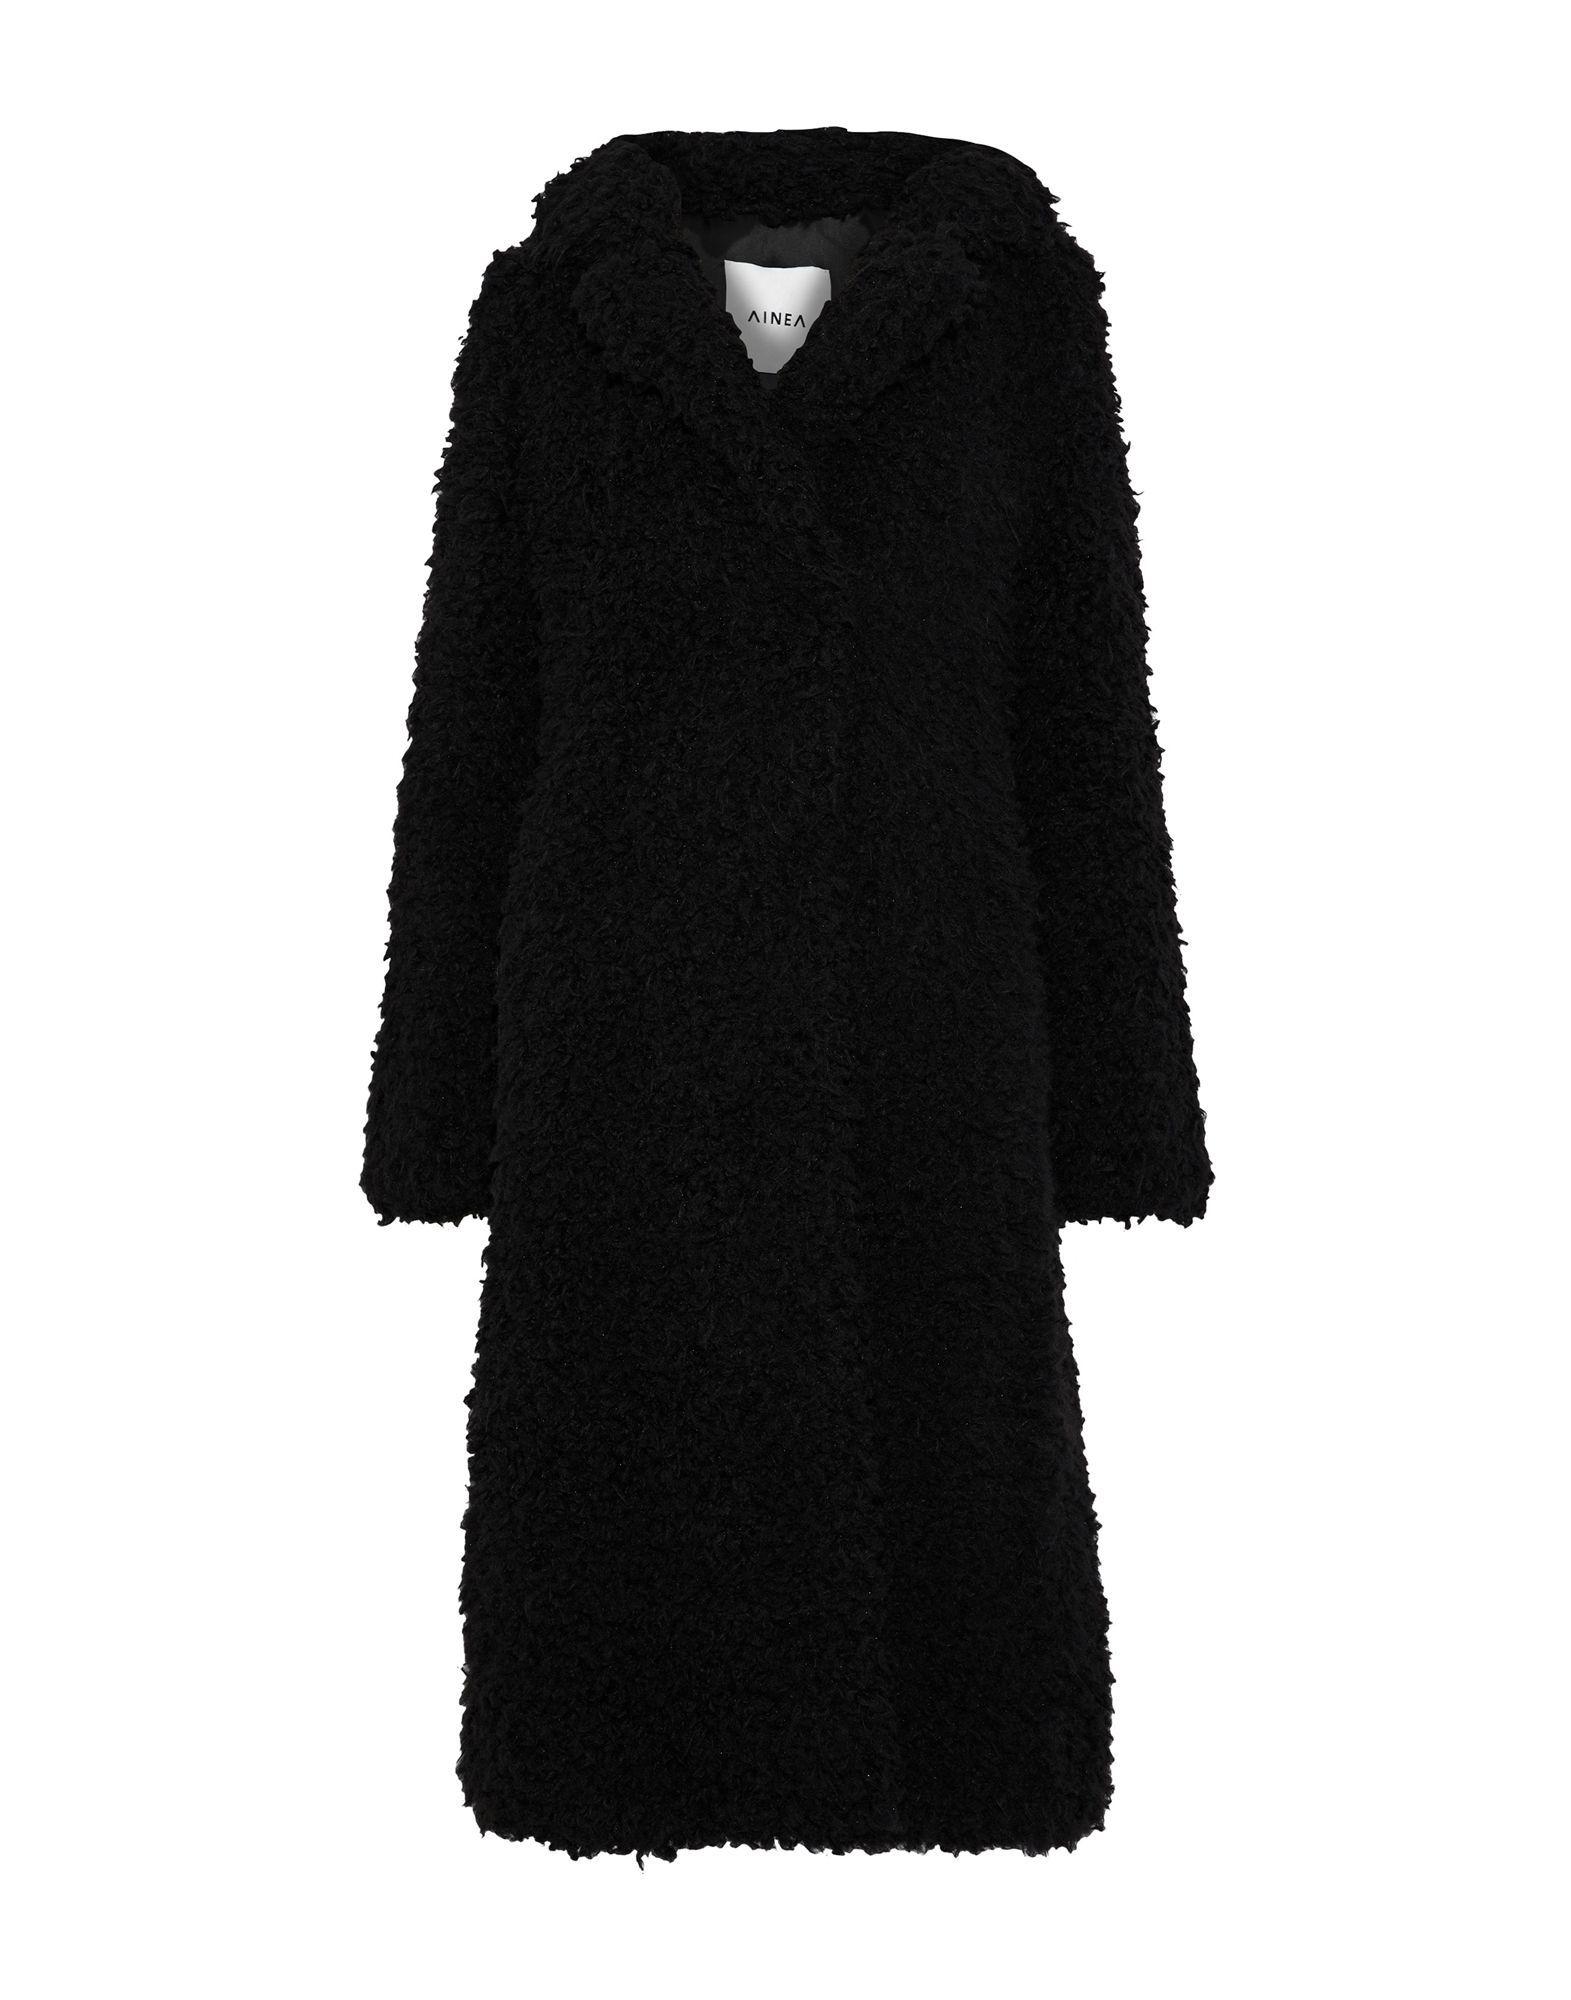 Ainea Women's Teddy Coat Acrilyc